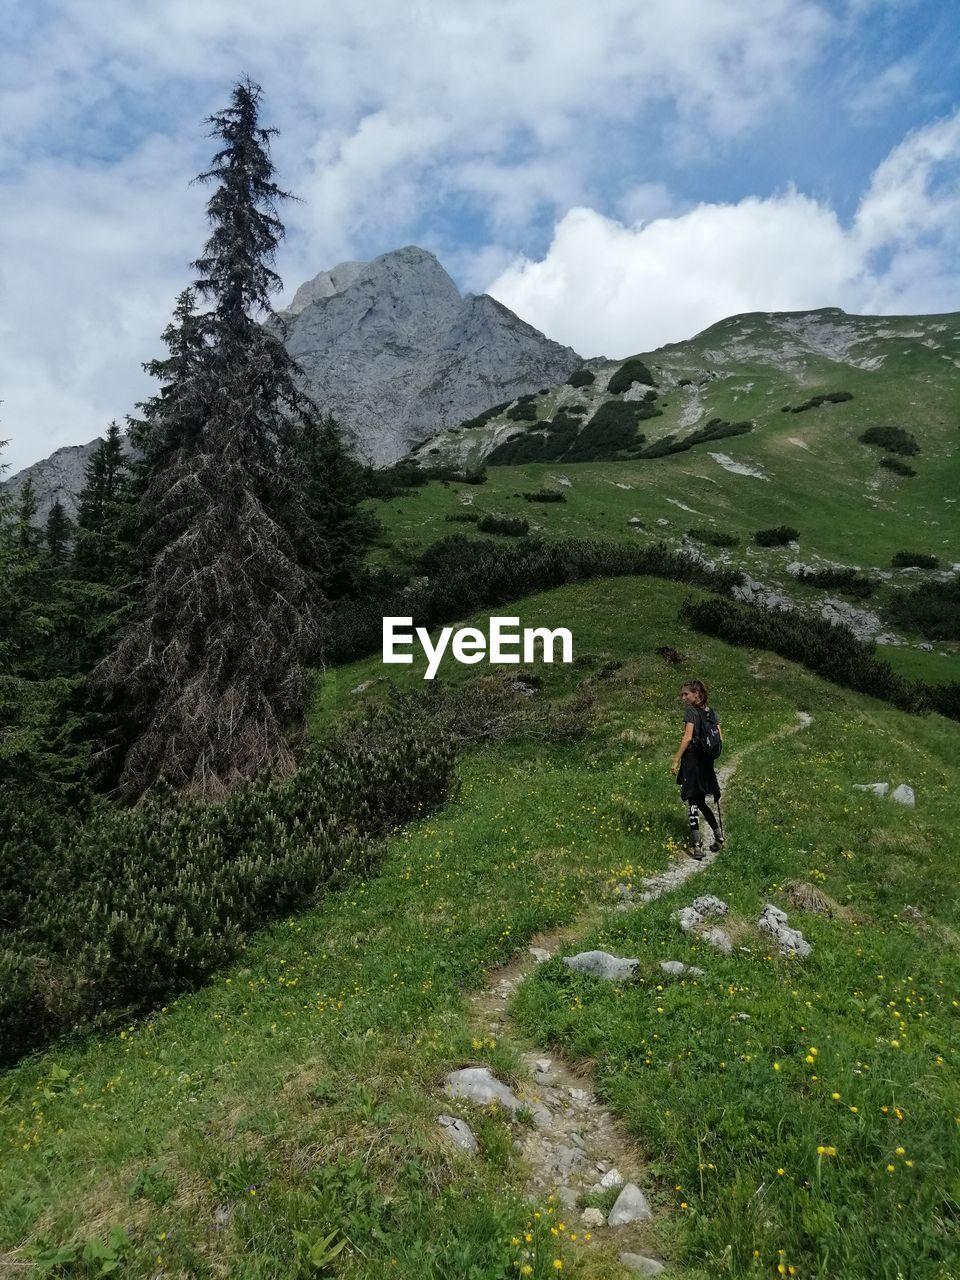 Woman walking on mountain against sky